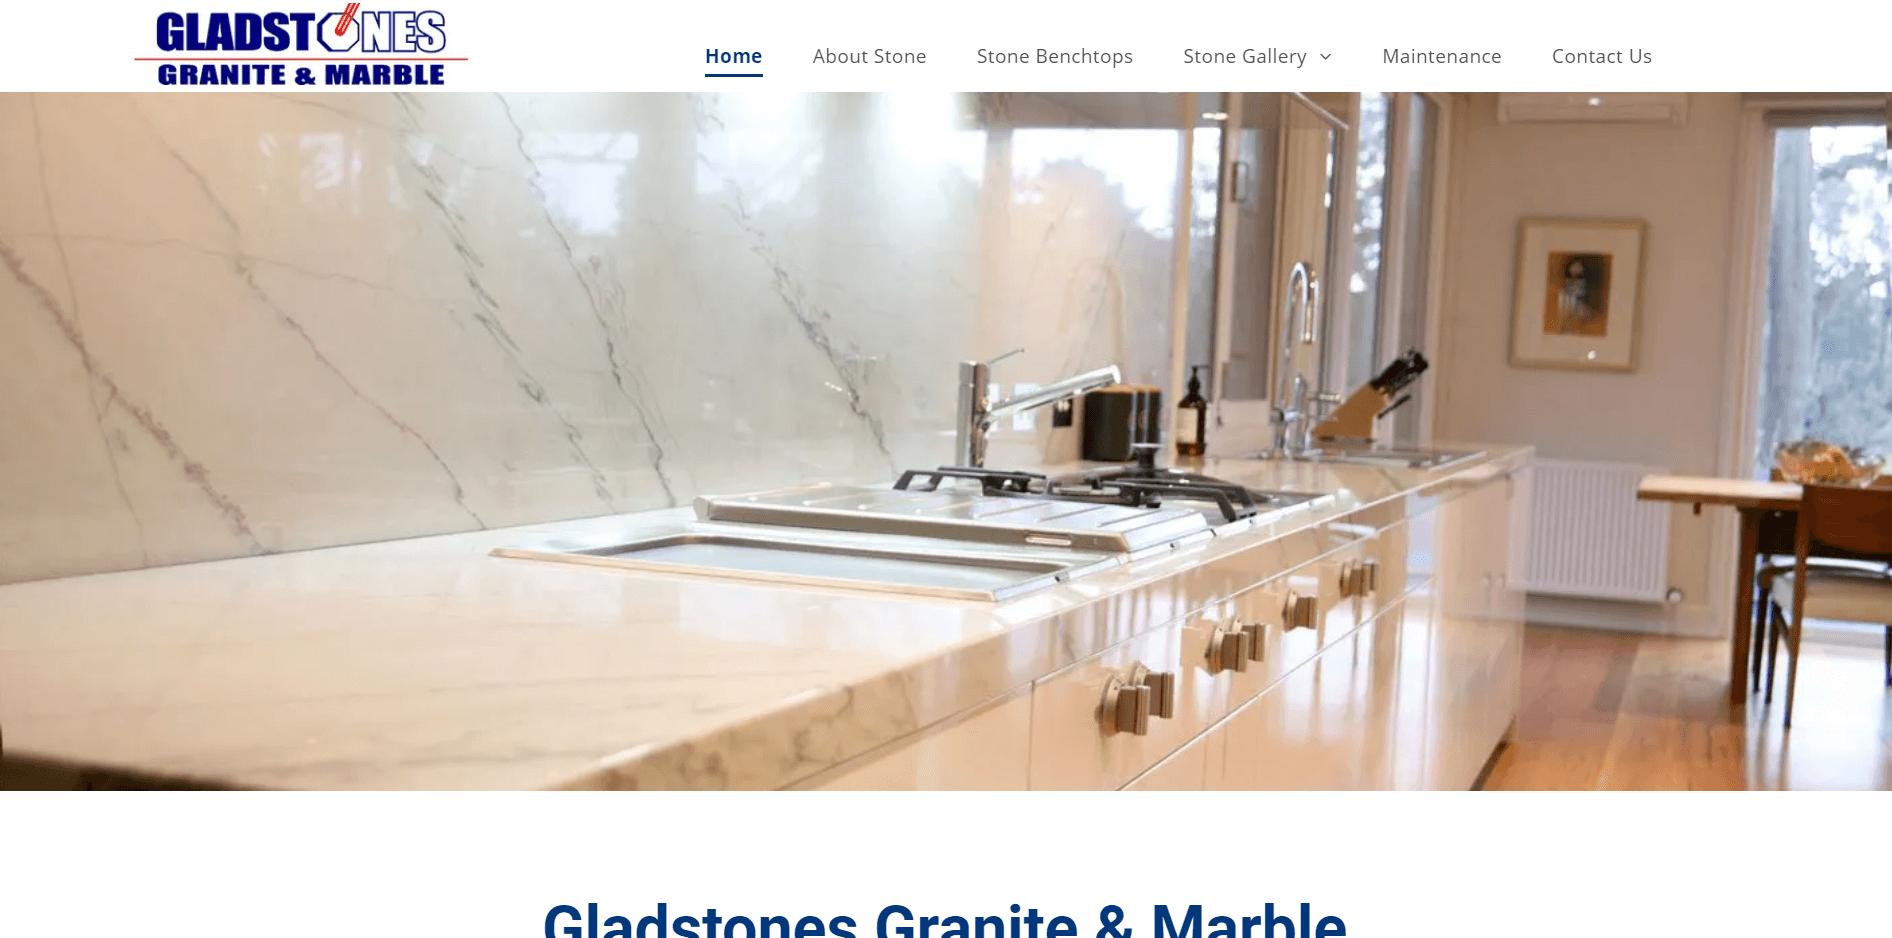 Gladstones Granite & Marble